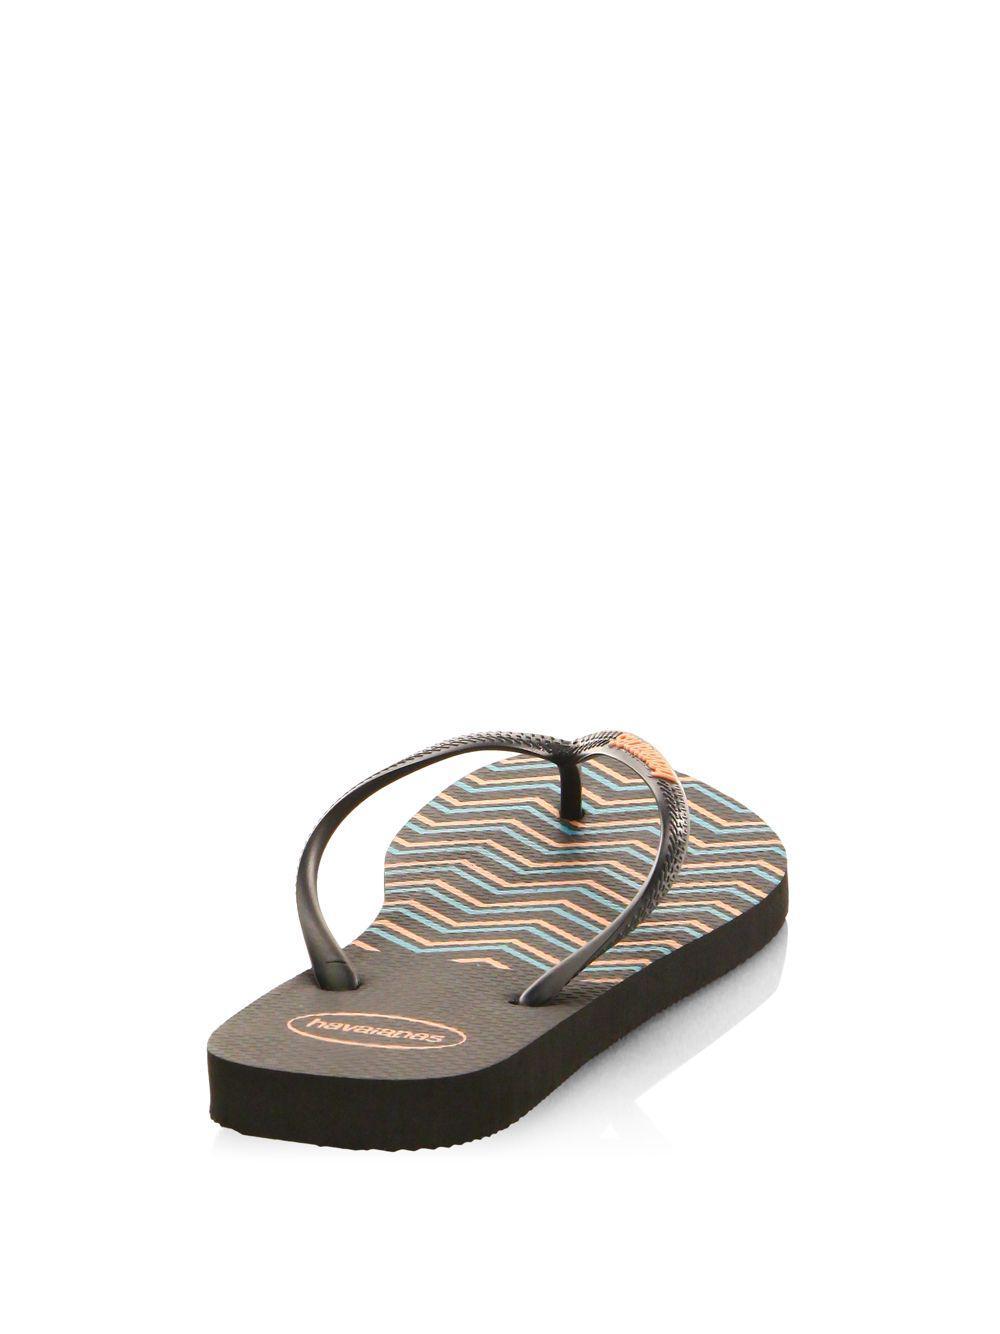 f70957e33e05b Havaianas Slim Zigzag Flip Flops in Black - Save 25.0% - Lyst